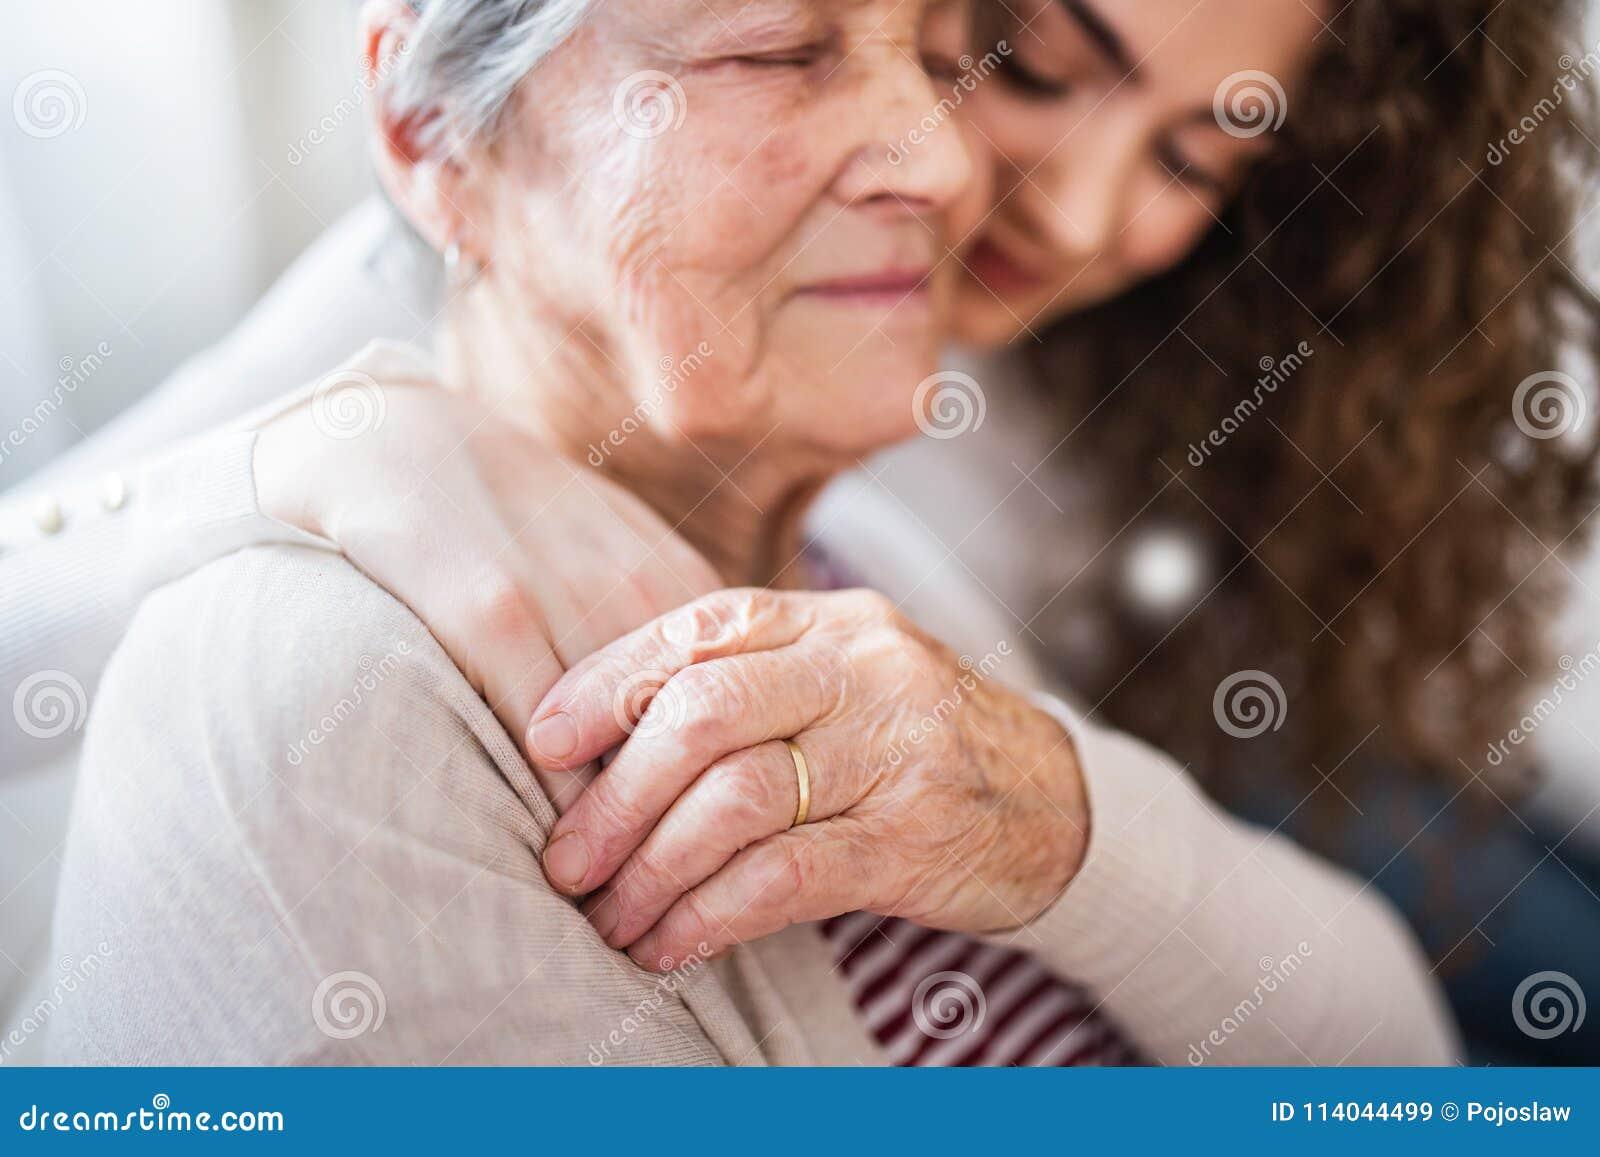 Девочка-подросток с бабушкой дома, обнимающ